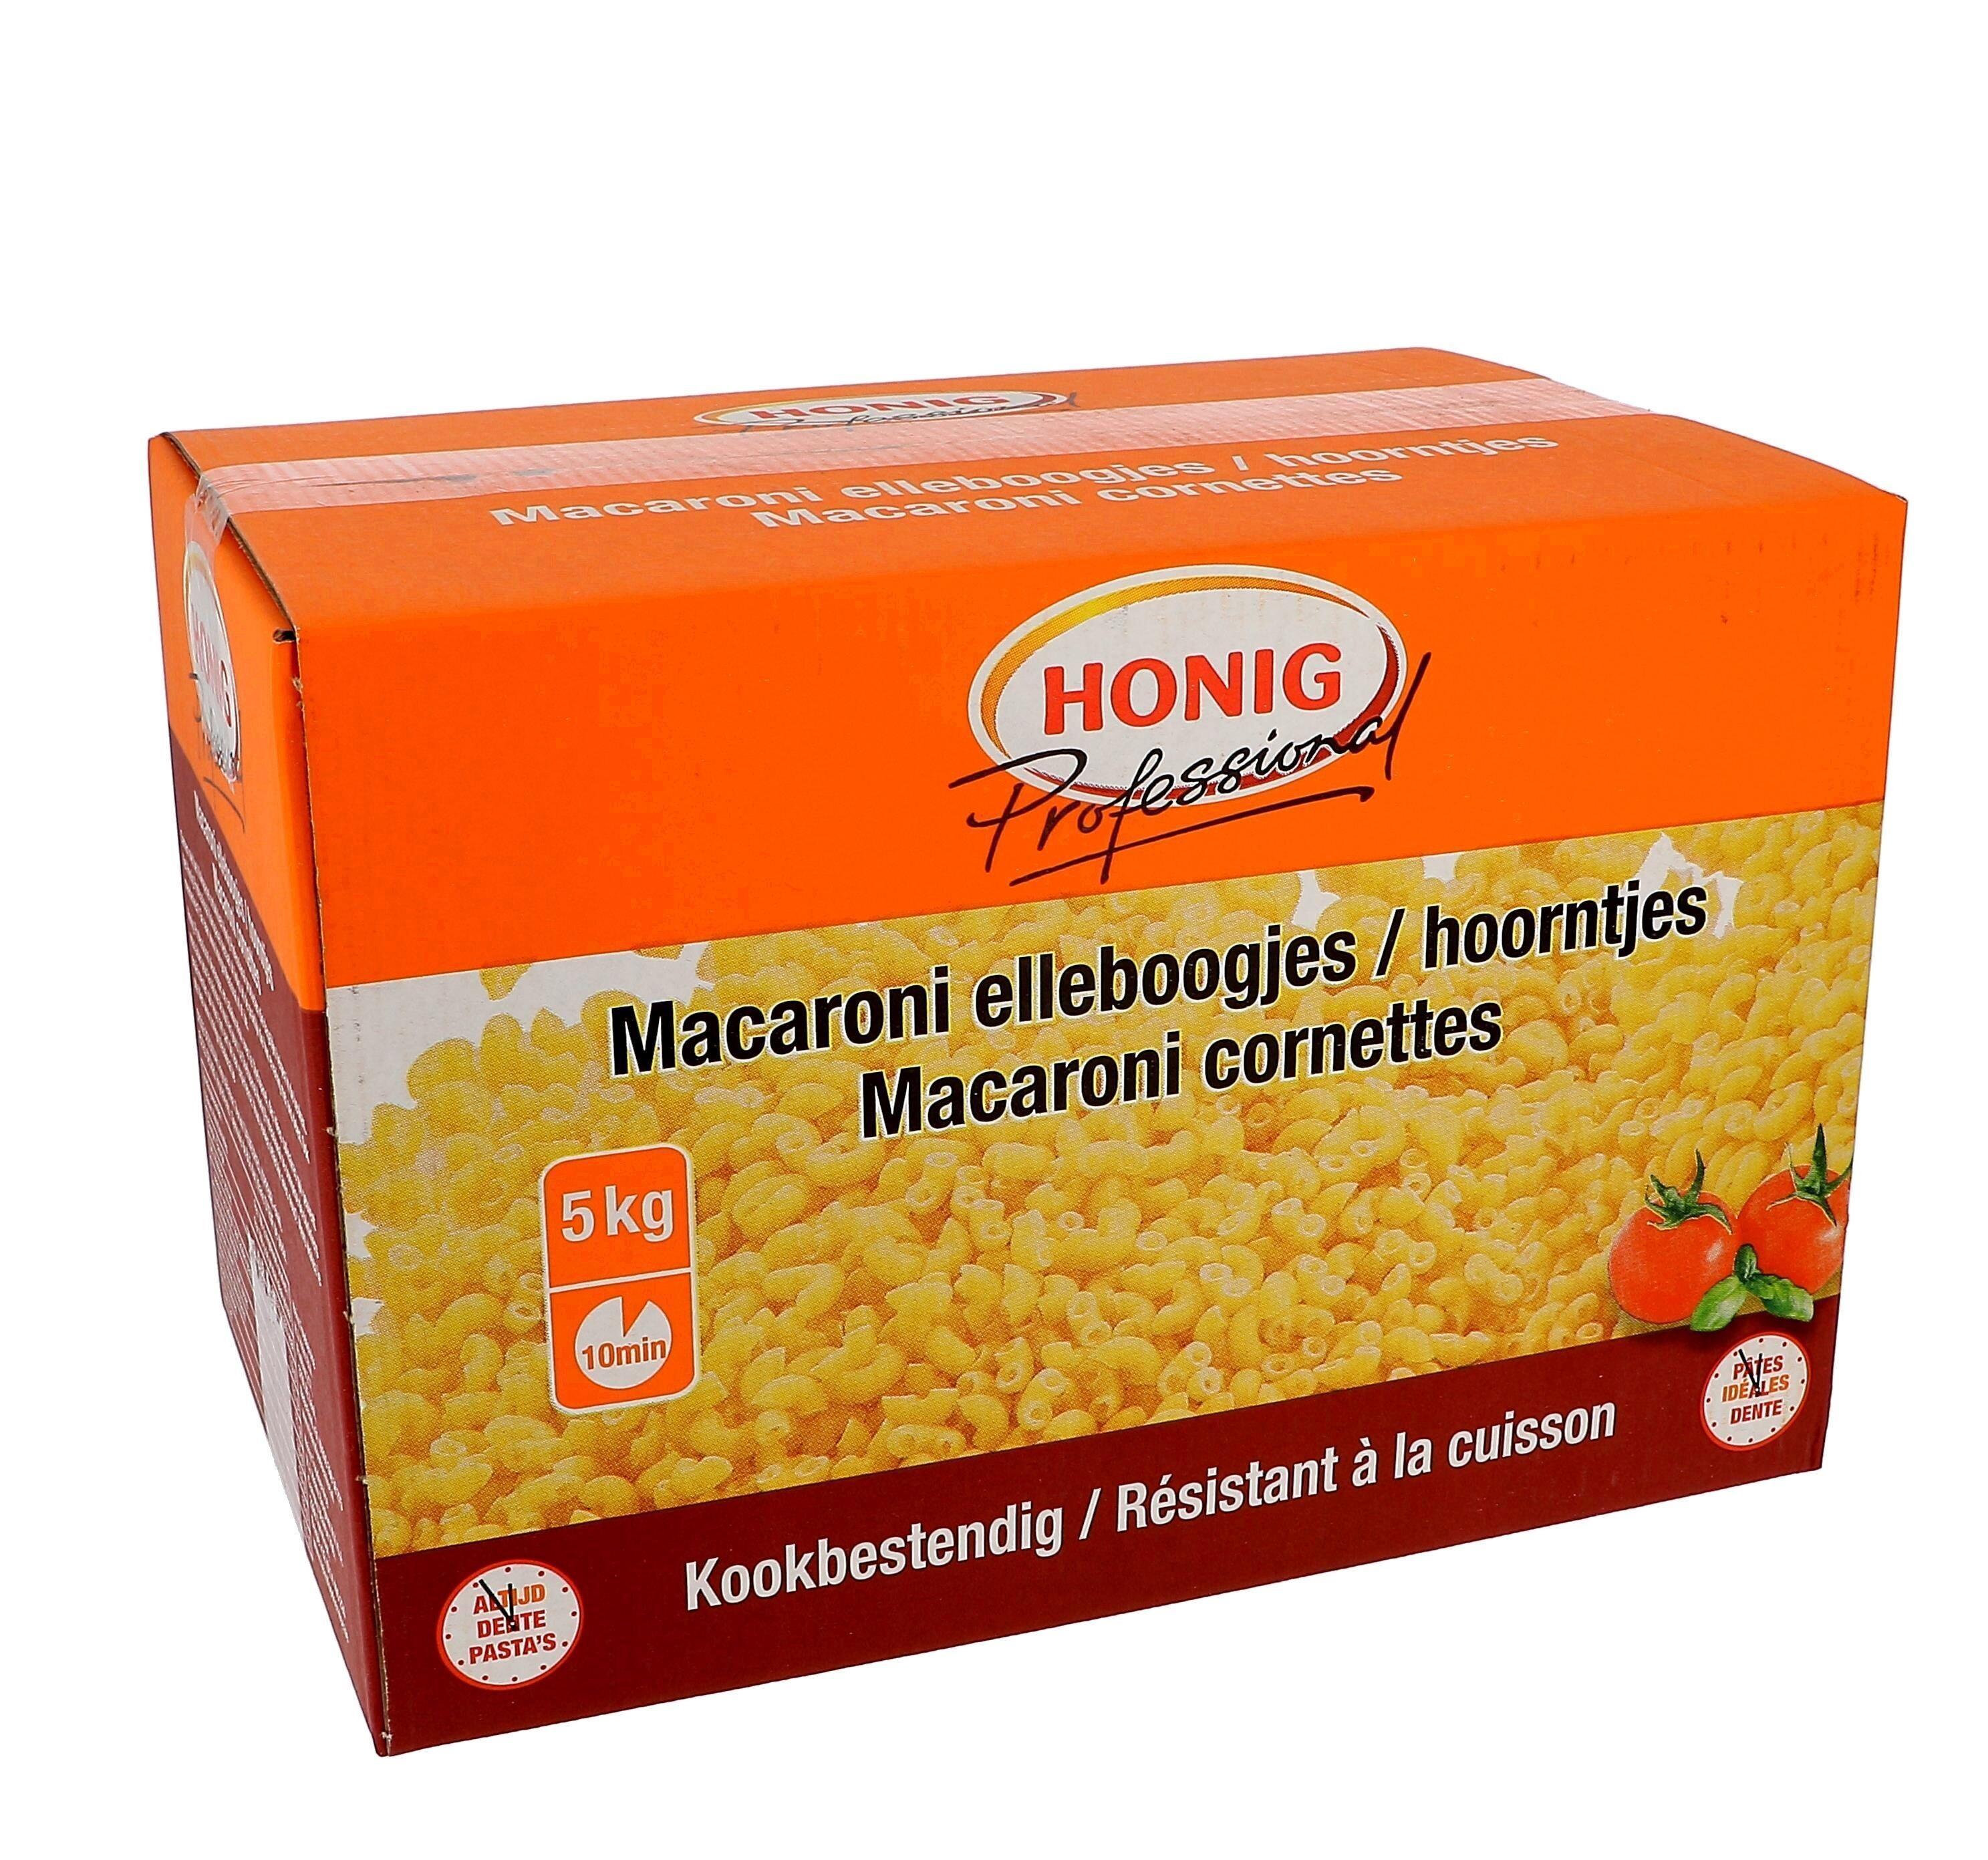 Honig cones (macaroni) 5kg pasta for soup